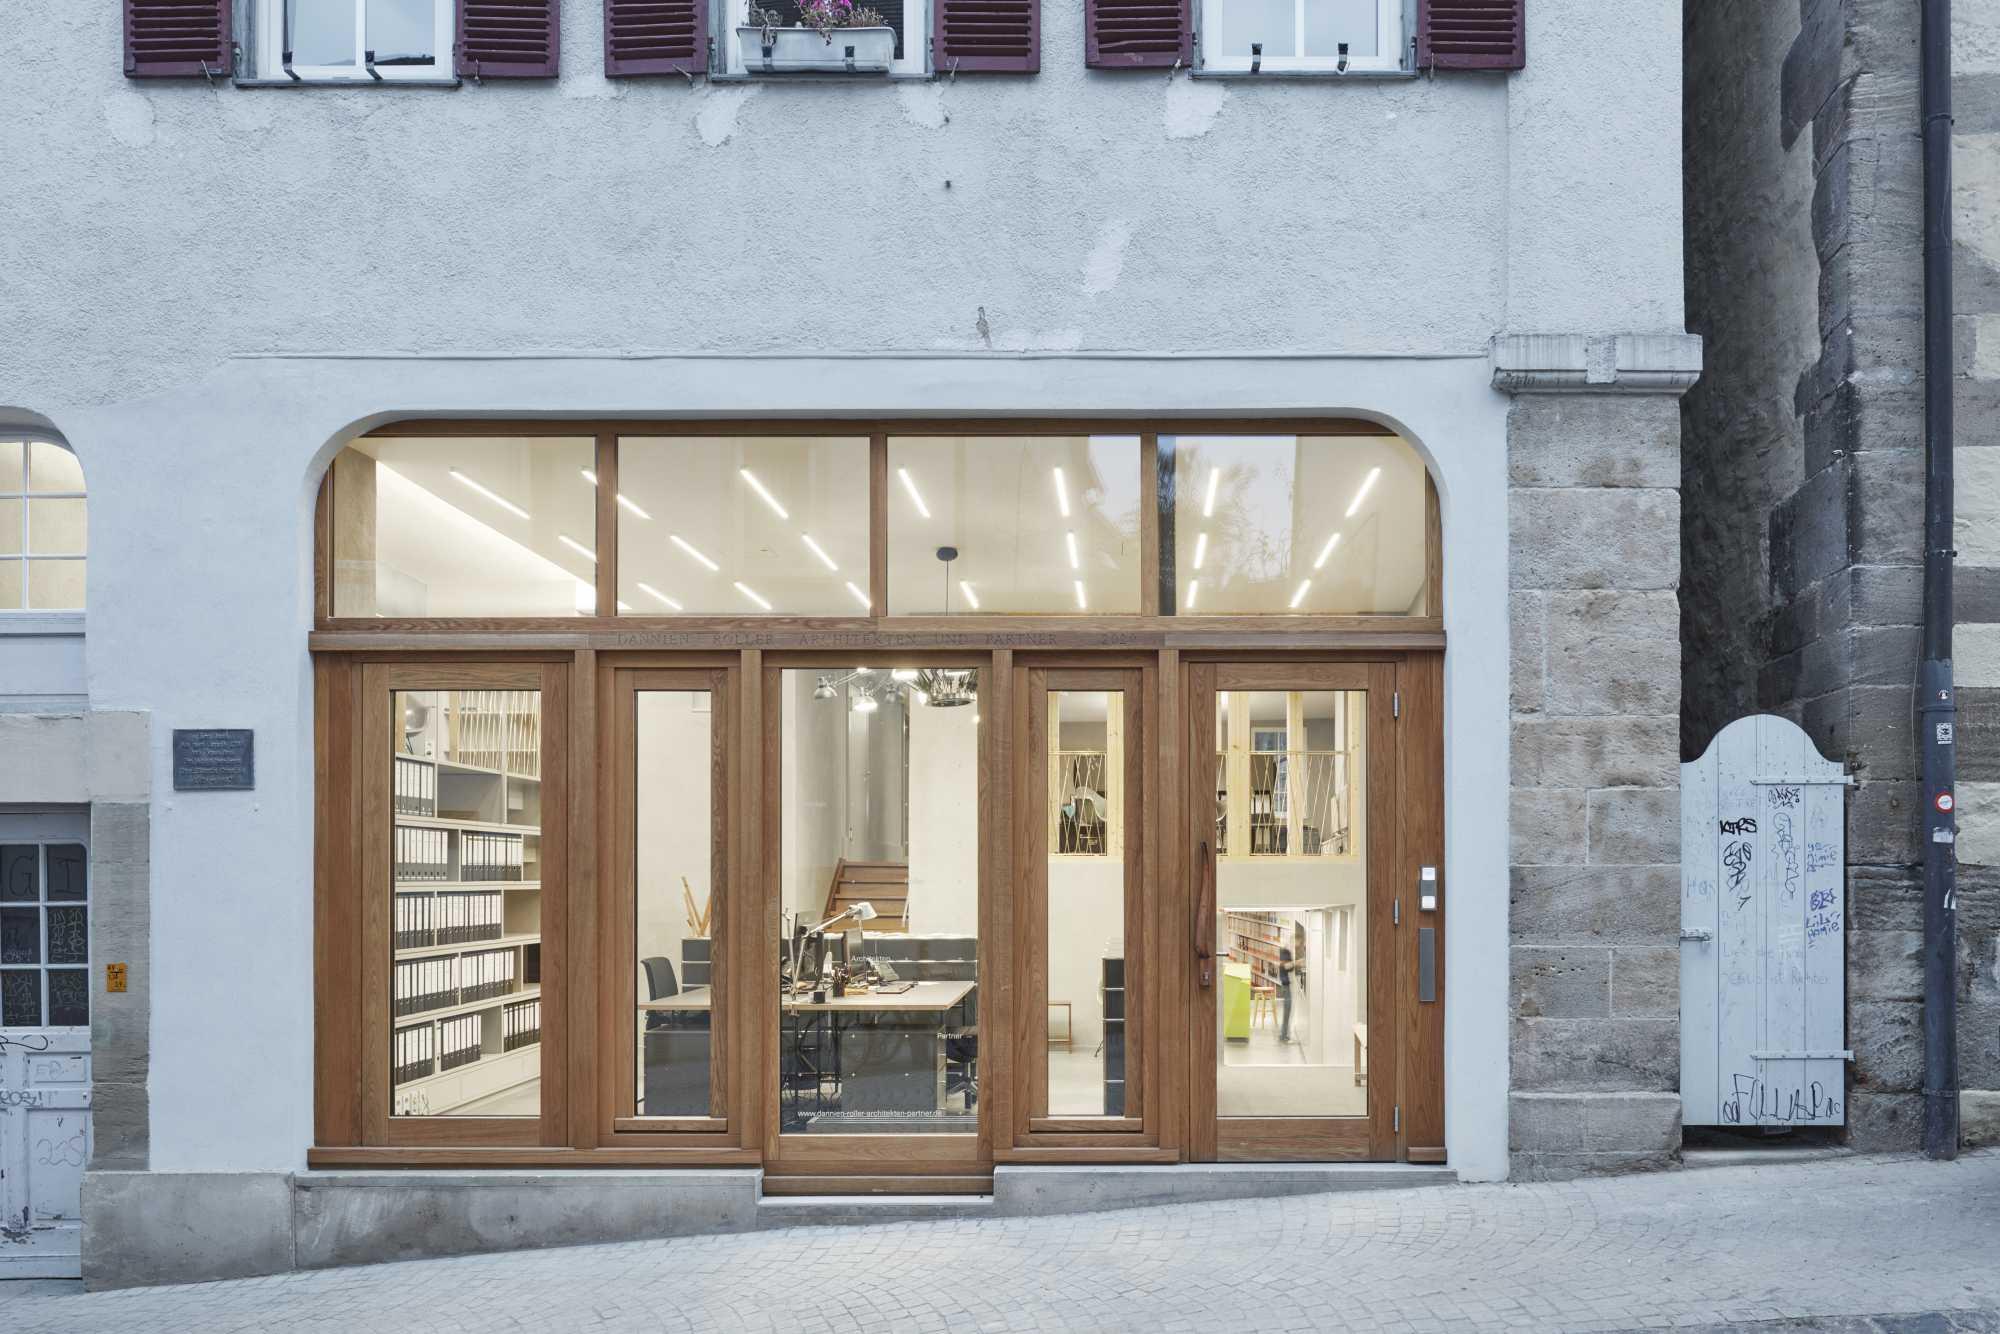 ›Bau der Woche‹ , Integrierende Architektur bei German Architects  ({project_images:field_row_count})